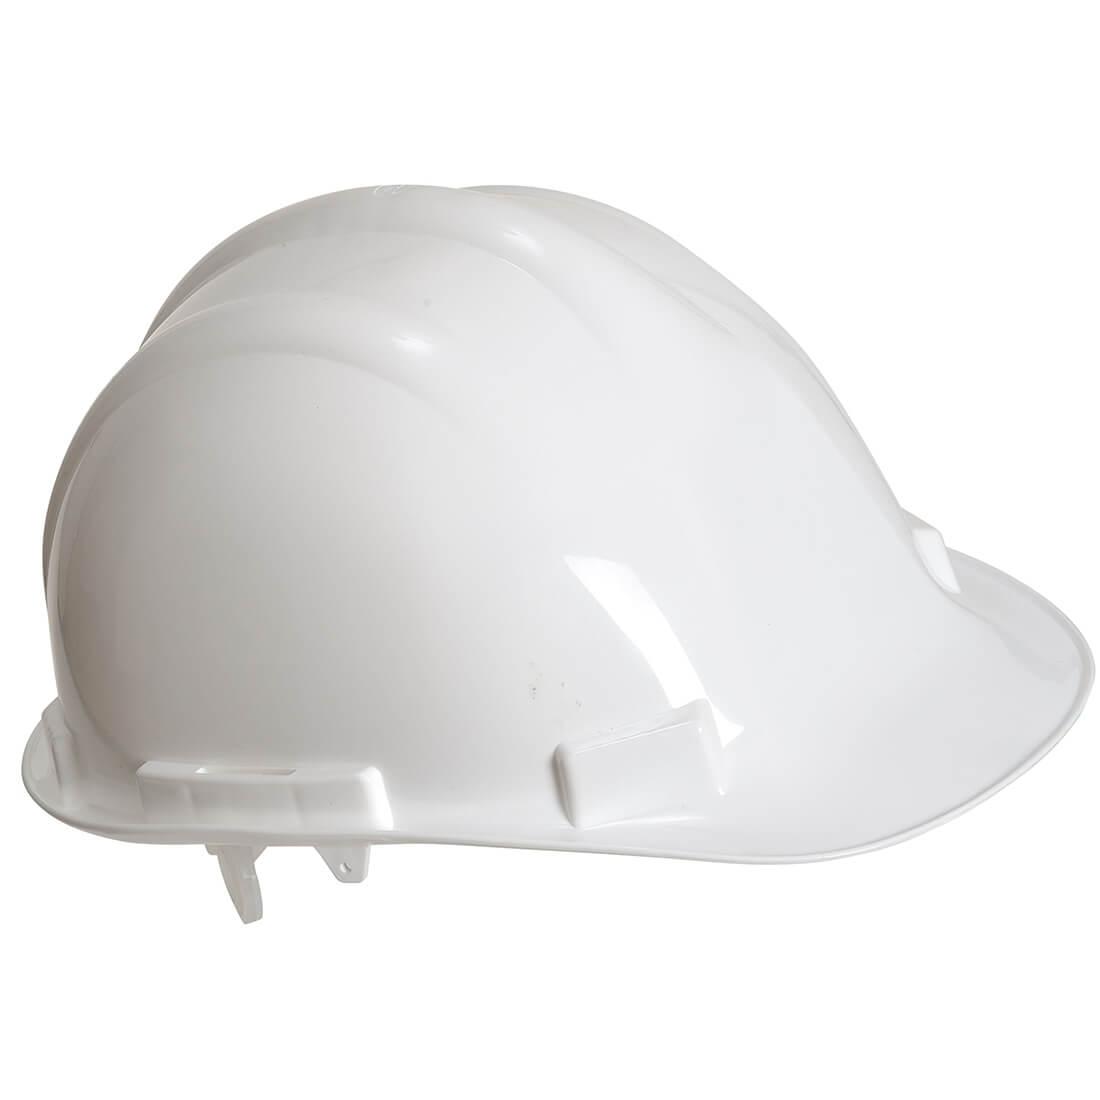 Casca de Protectie PP Safety - Echipamente de protectie personala